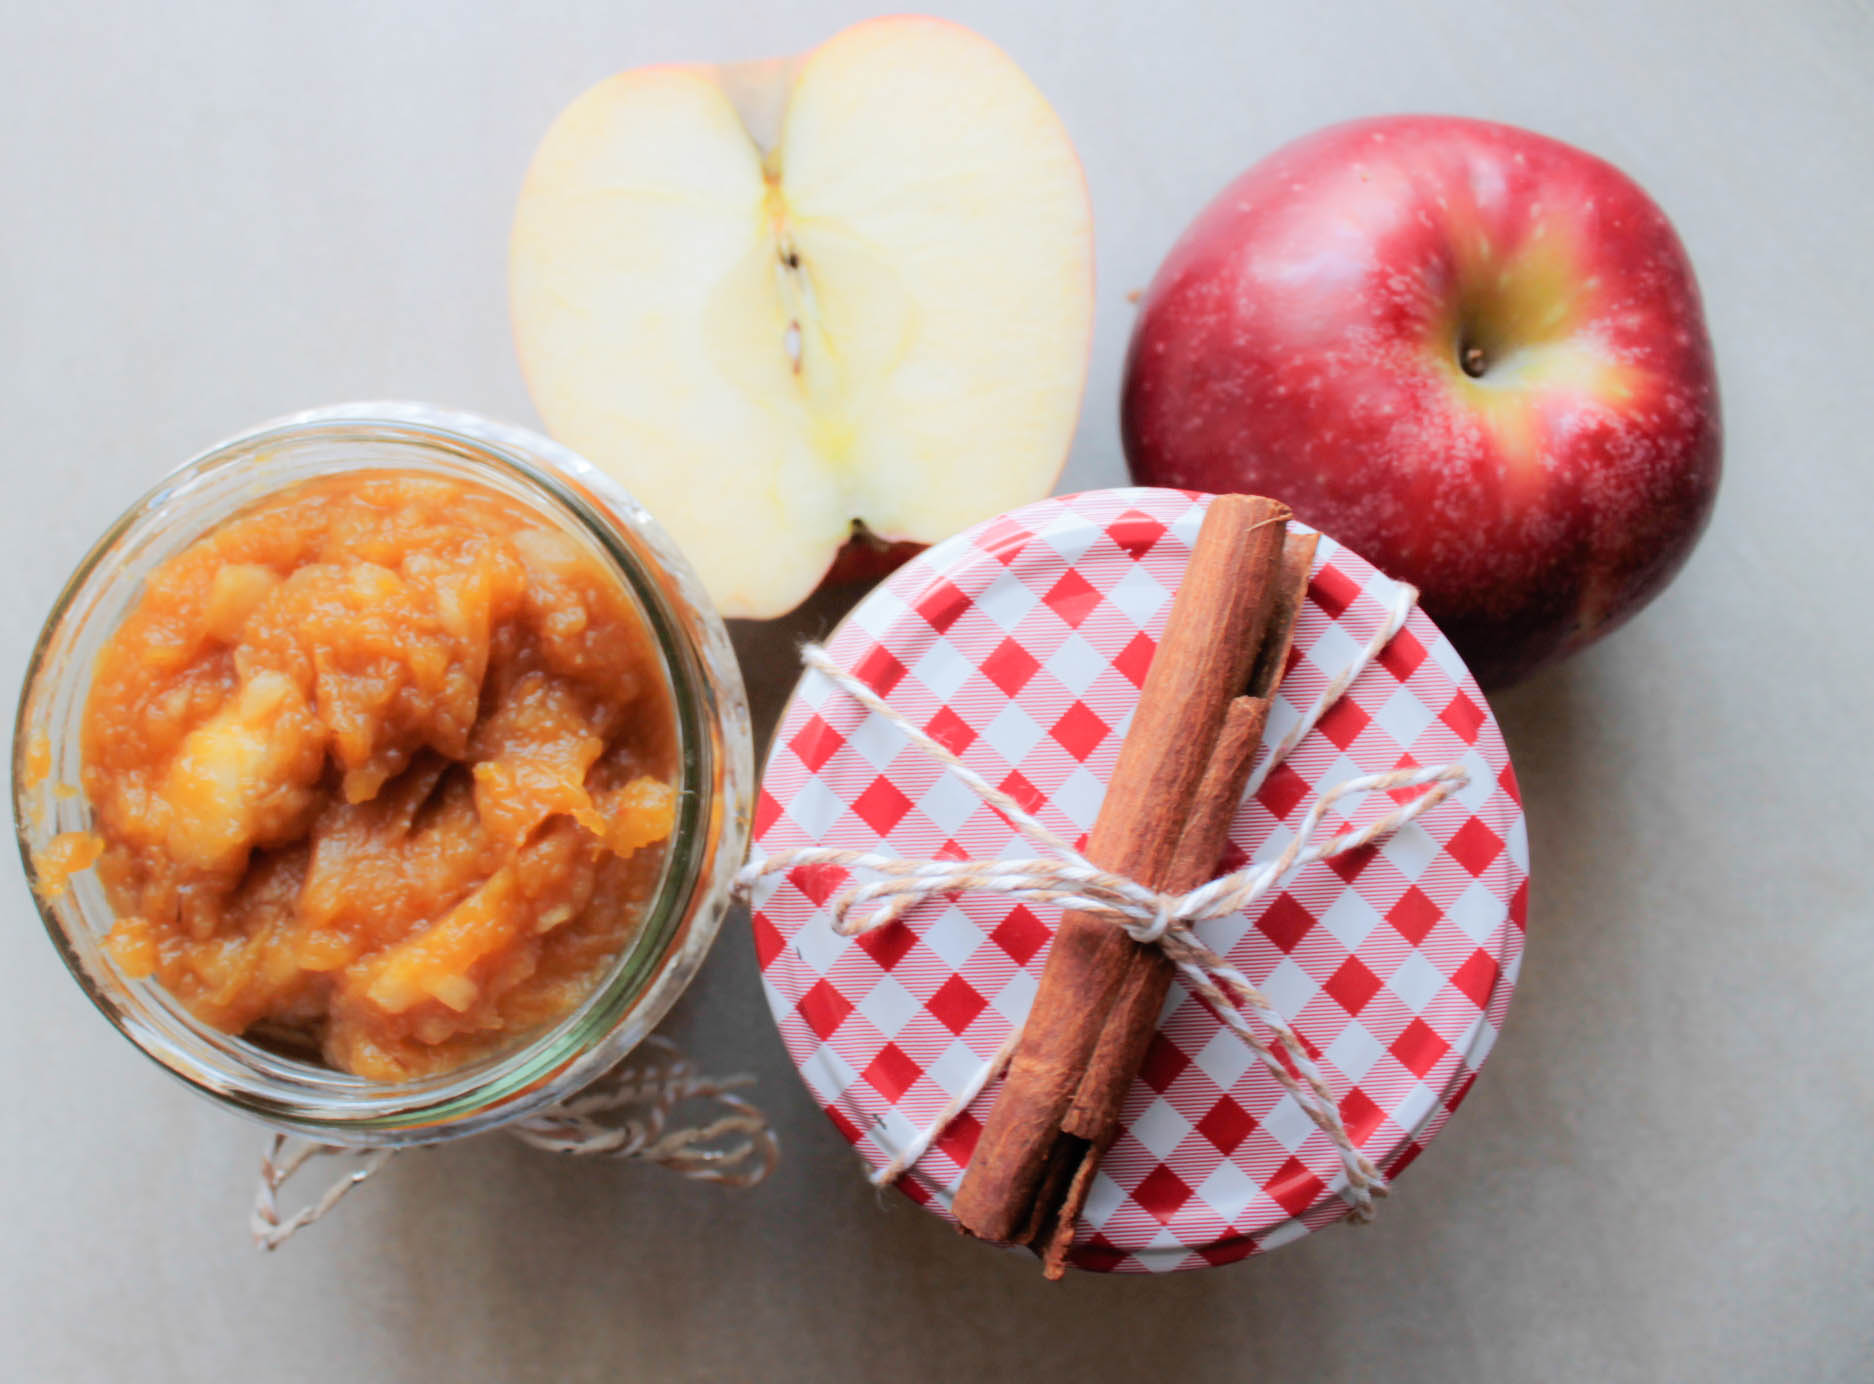 Konfitura z dyni i jabłek